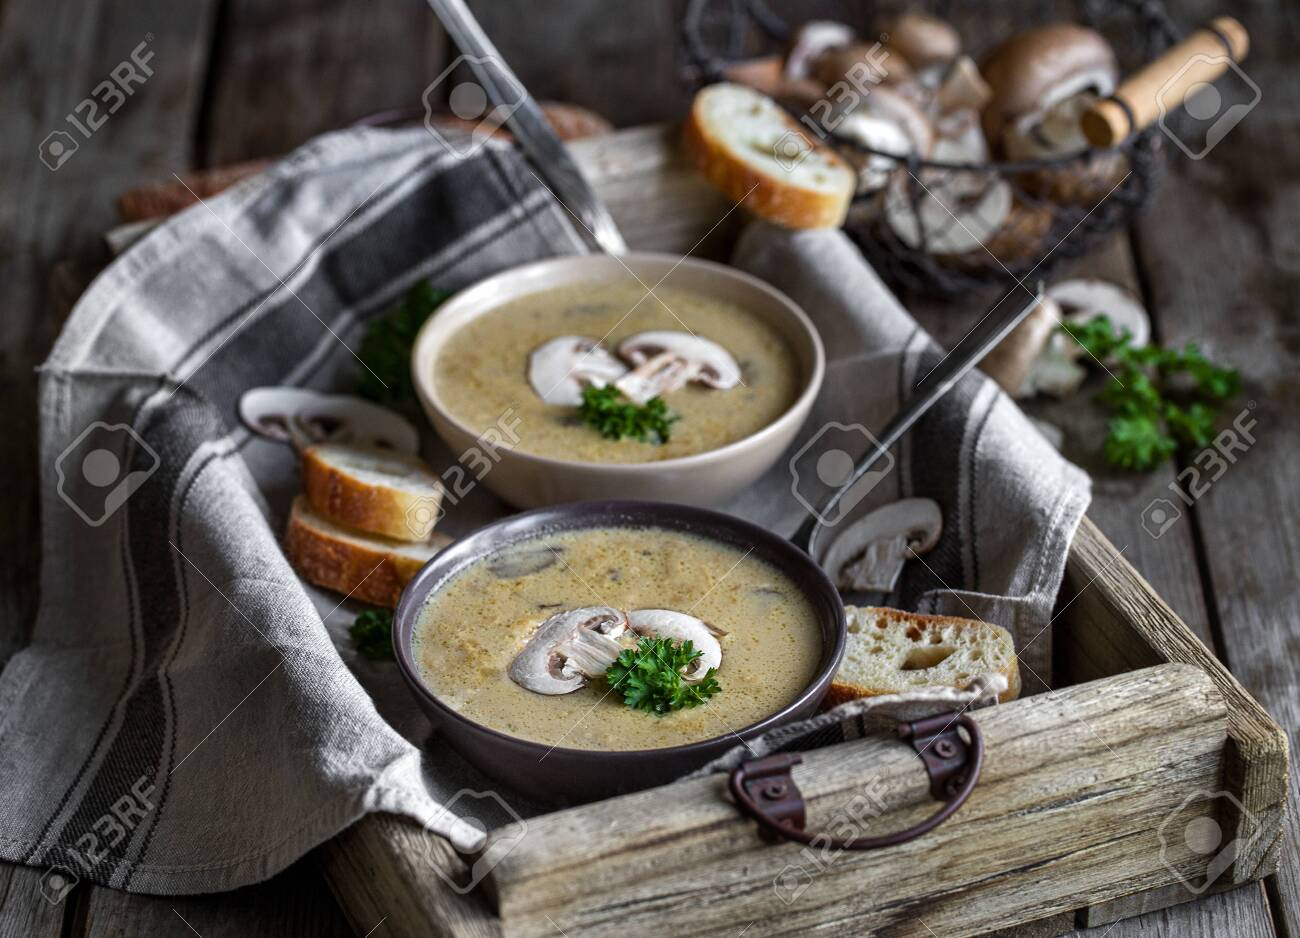 Delicious homemade mushrooum soup puree with portobello and wild mushrooms on rustic table - 138759171